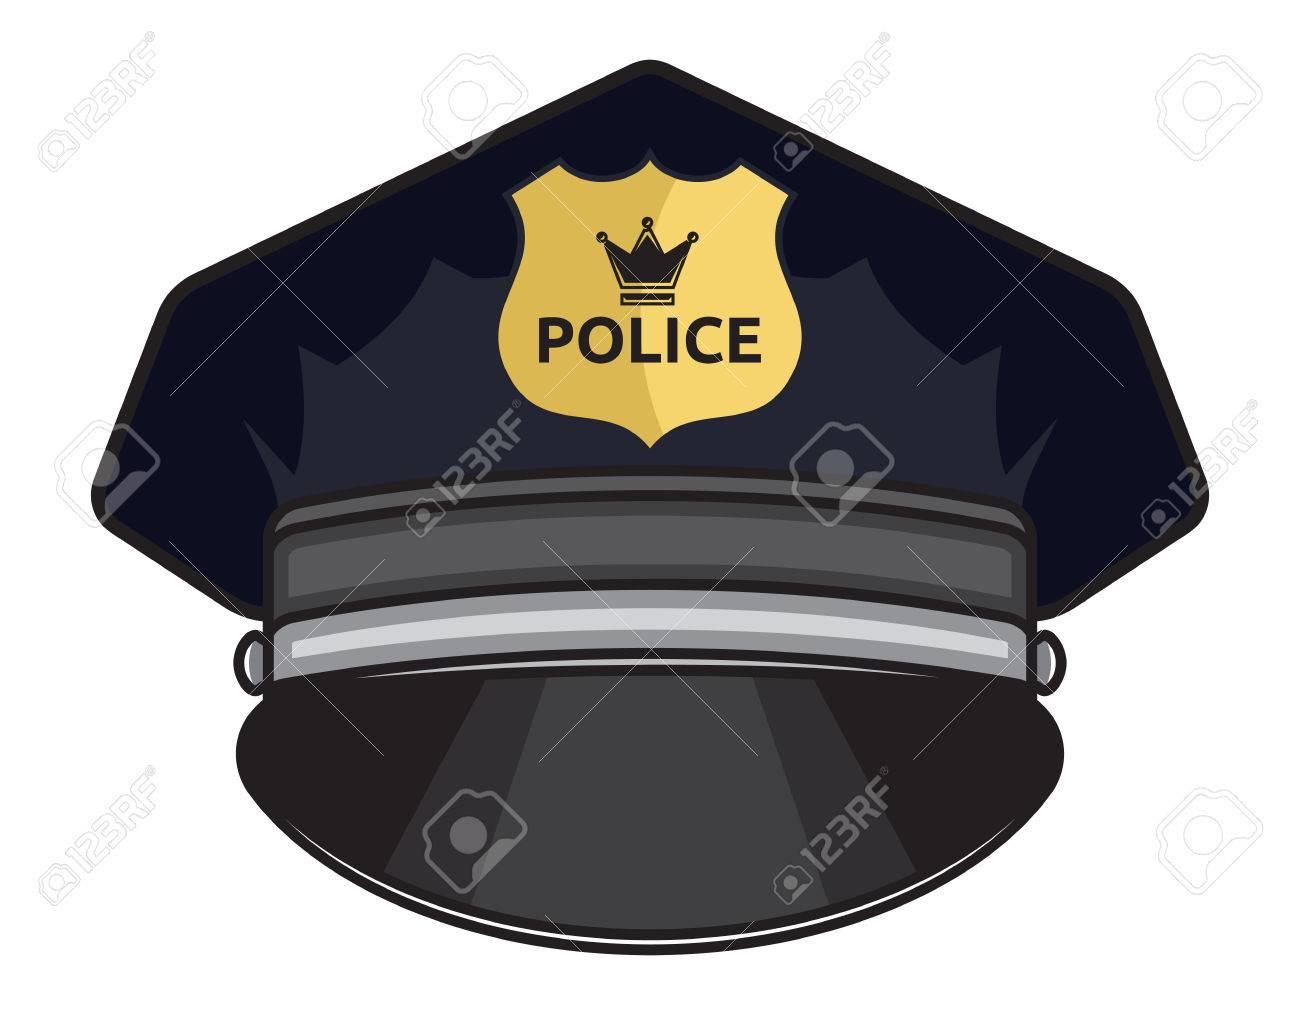 Police cap illustration - 41503043